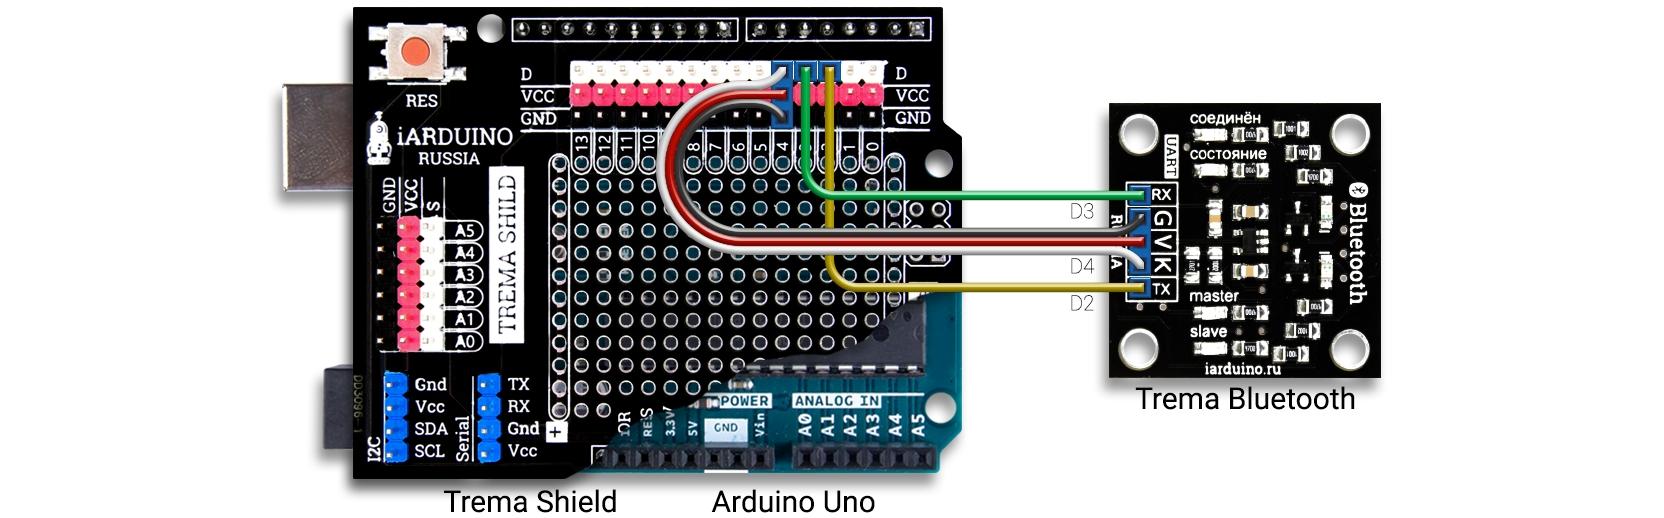 Подключение Trema Bluetooth модуля к Arduino